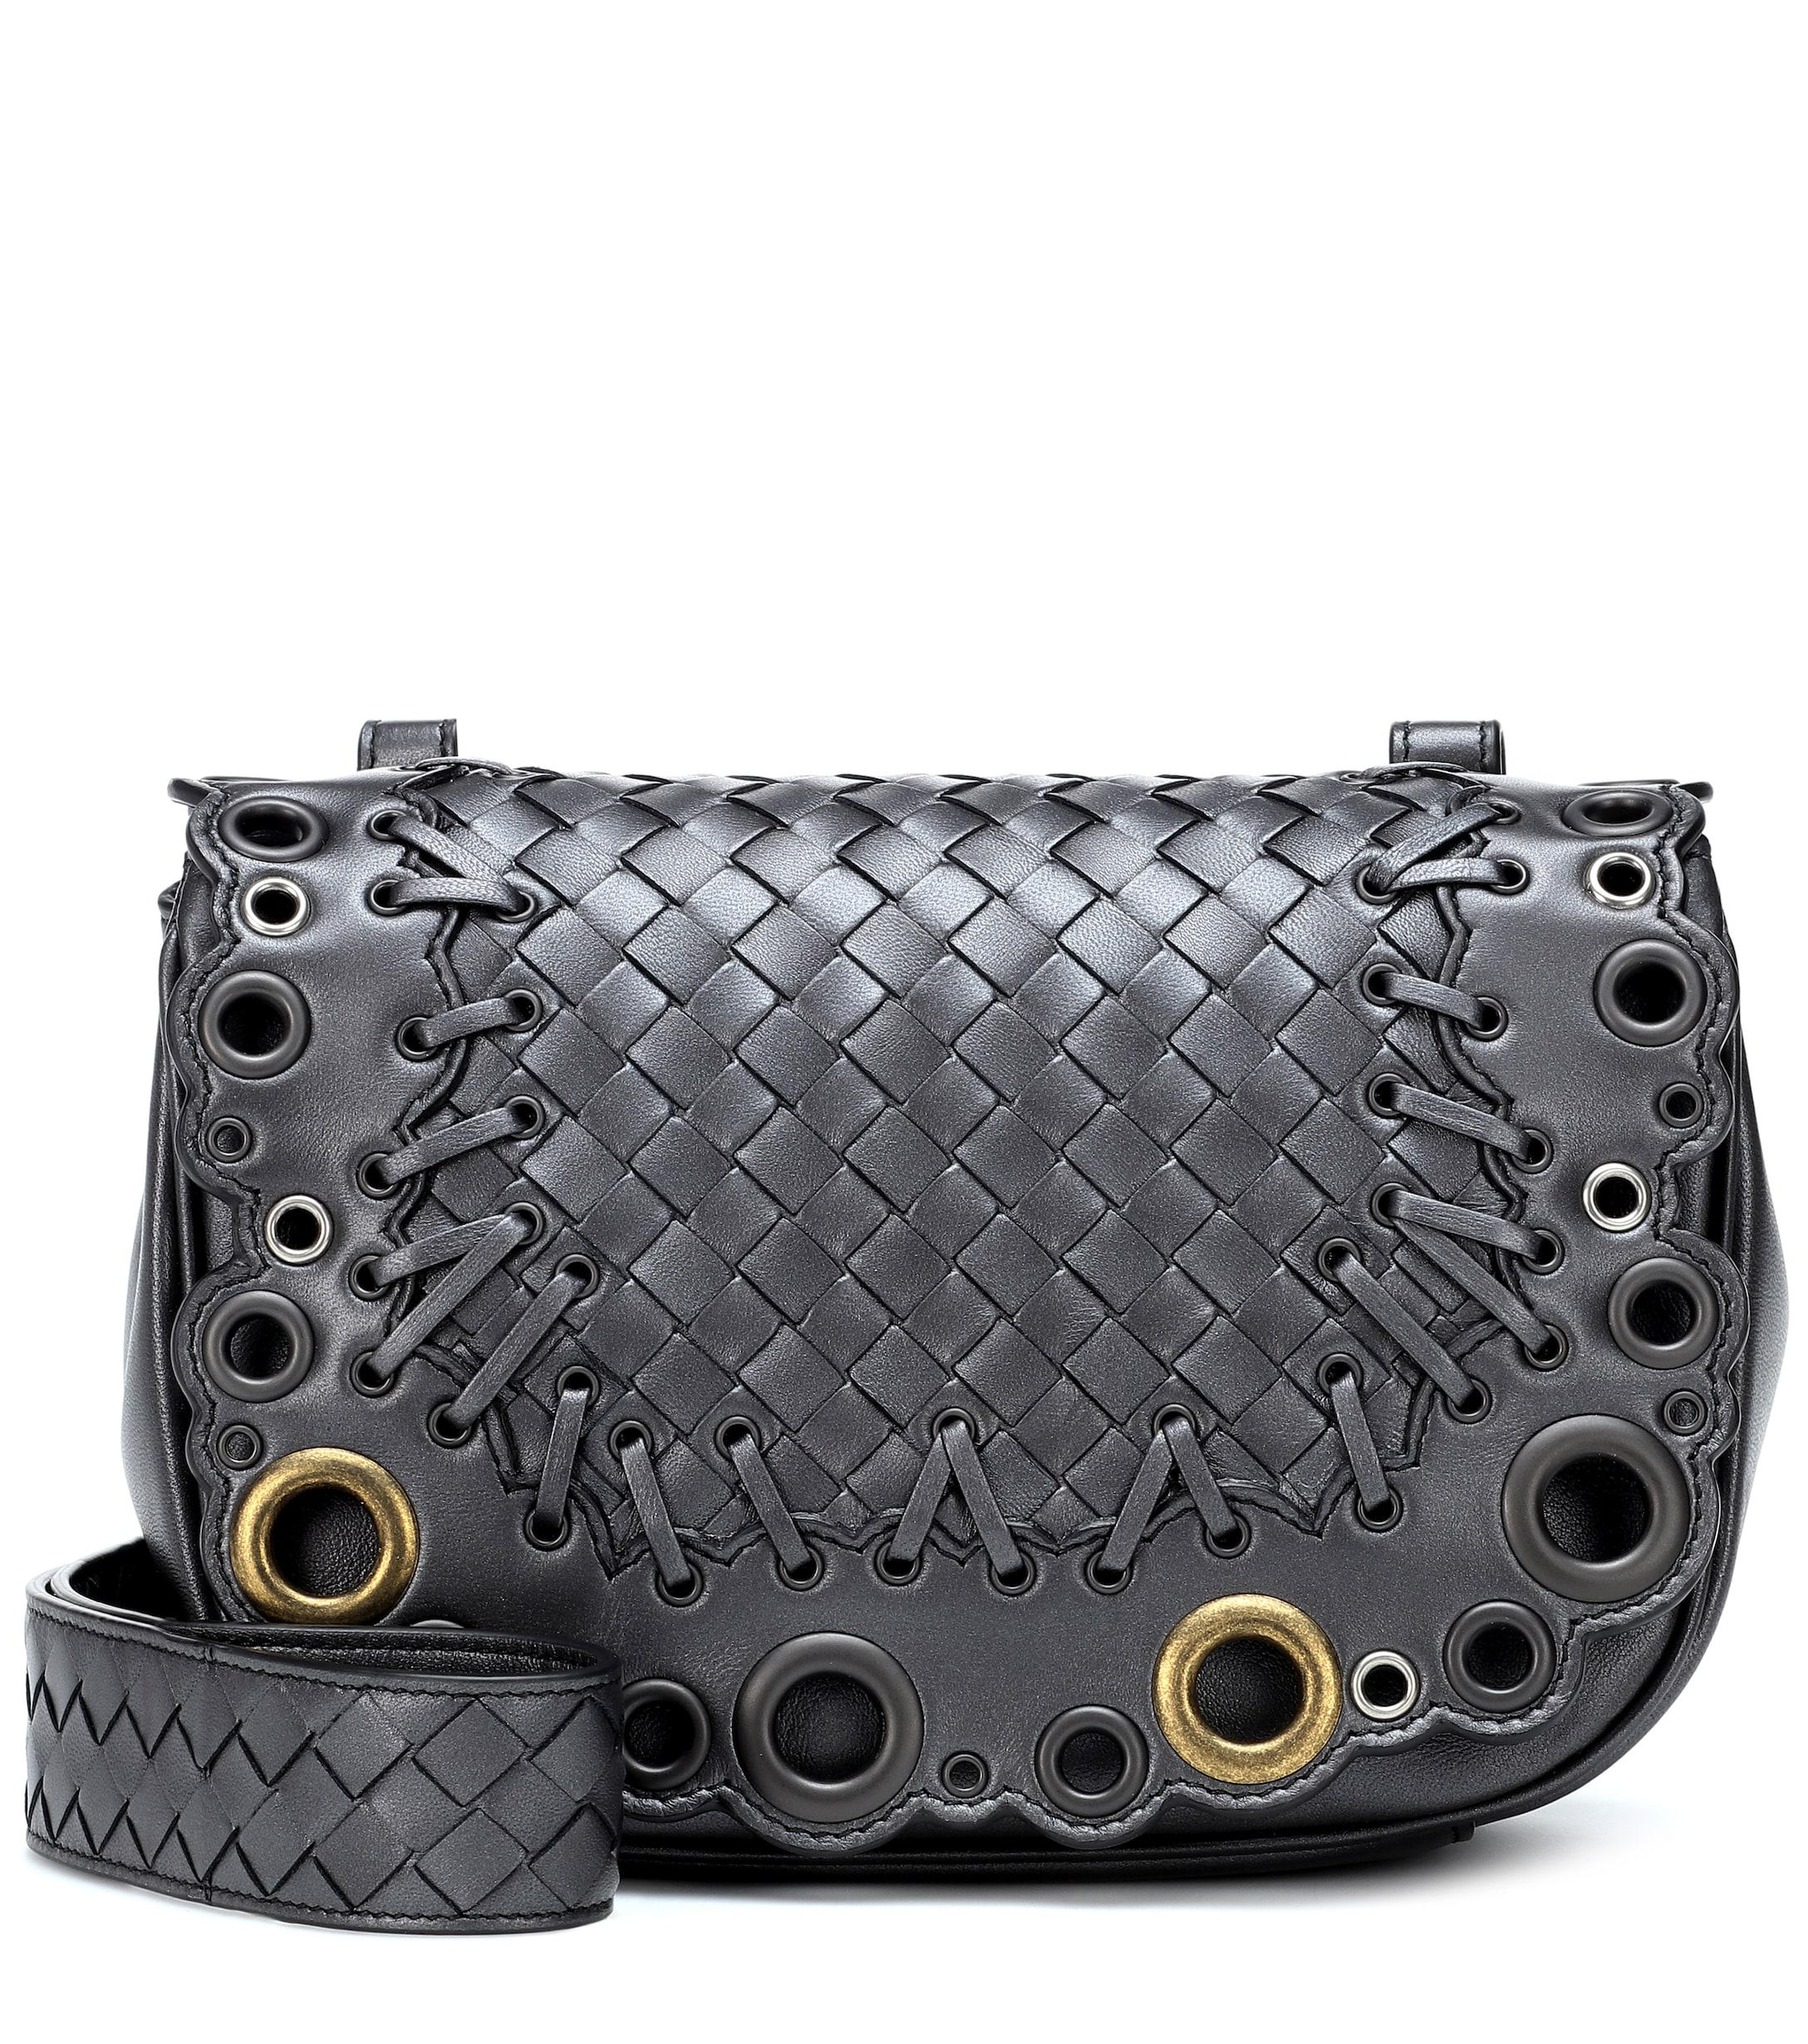 7b0f1ff28385 Bottega Veneta. Women s Bv Luna Leather Shoulder Bag